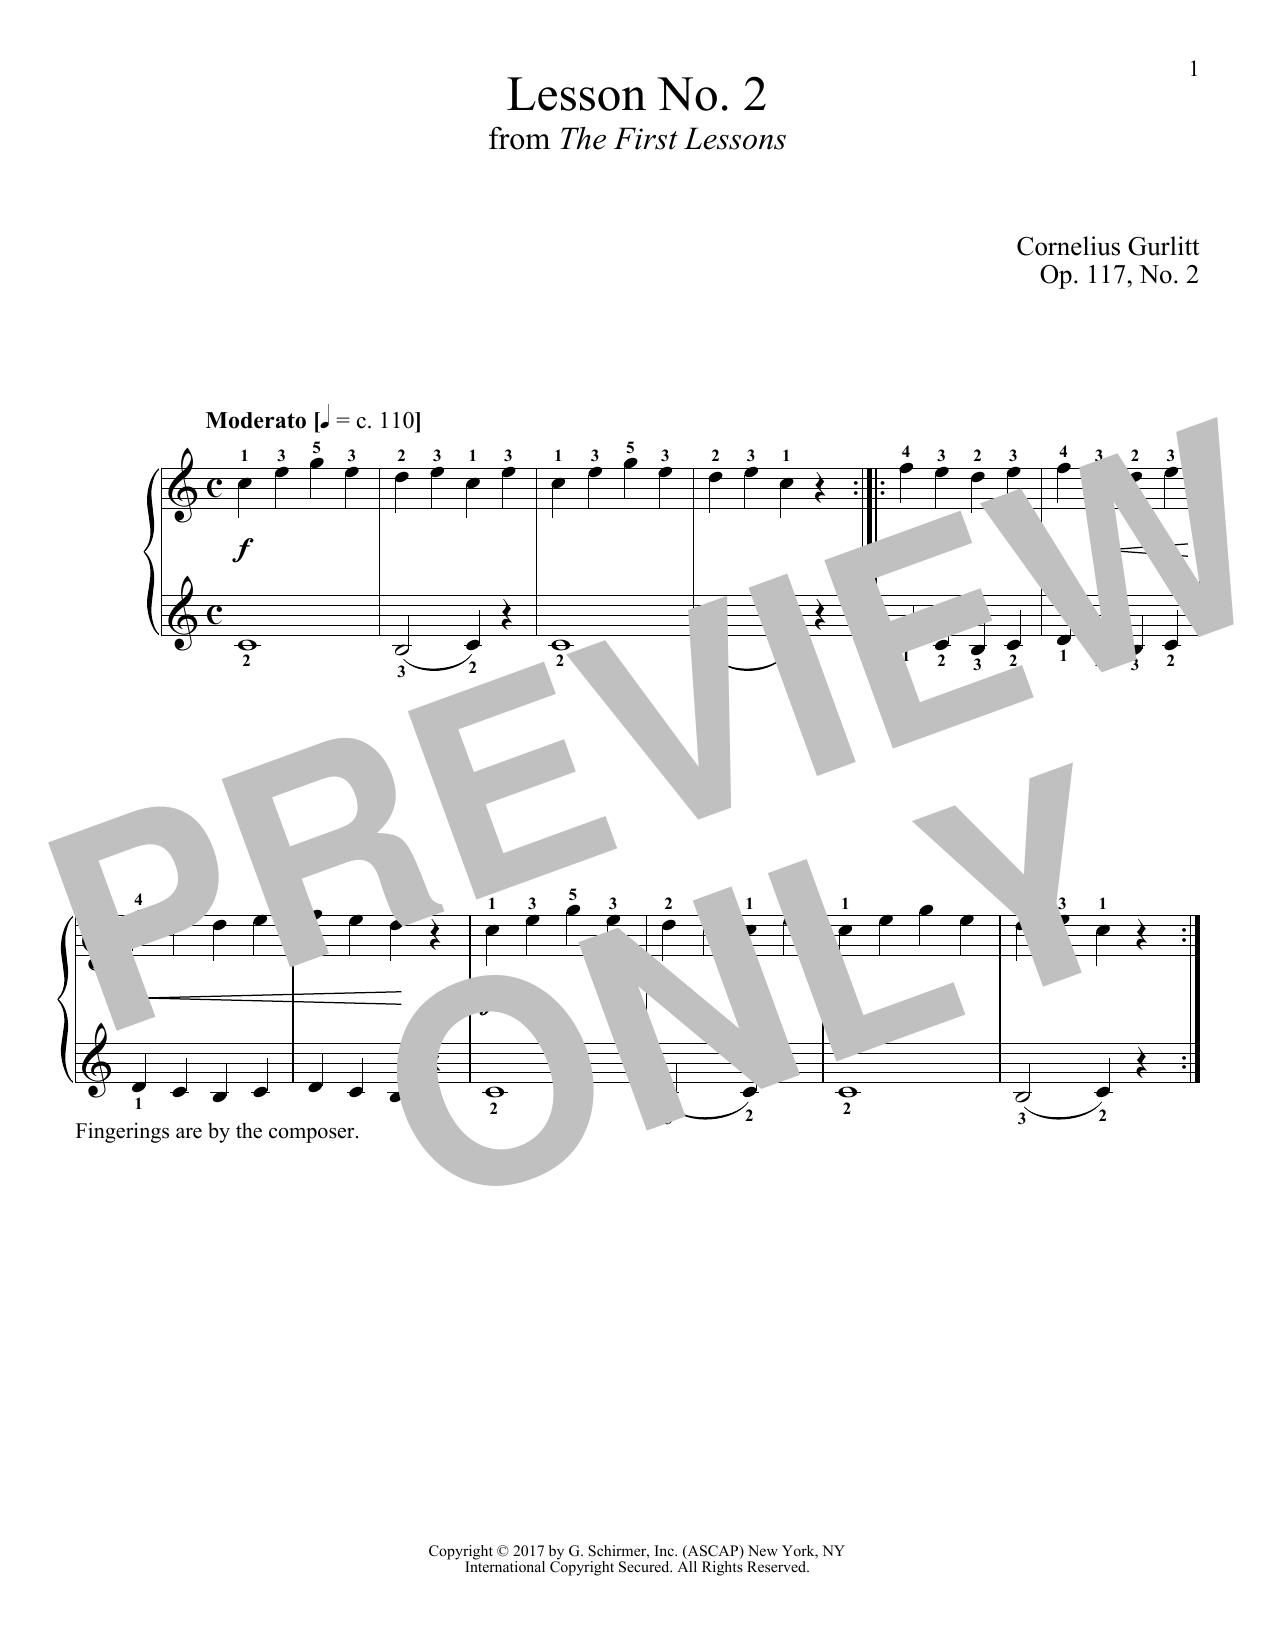 Moderato, Op. 117, No. 2 (Piano Solo)